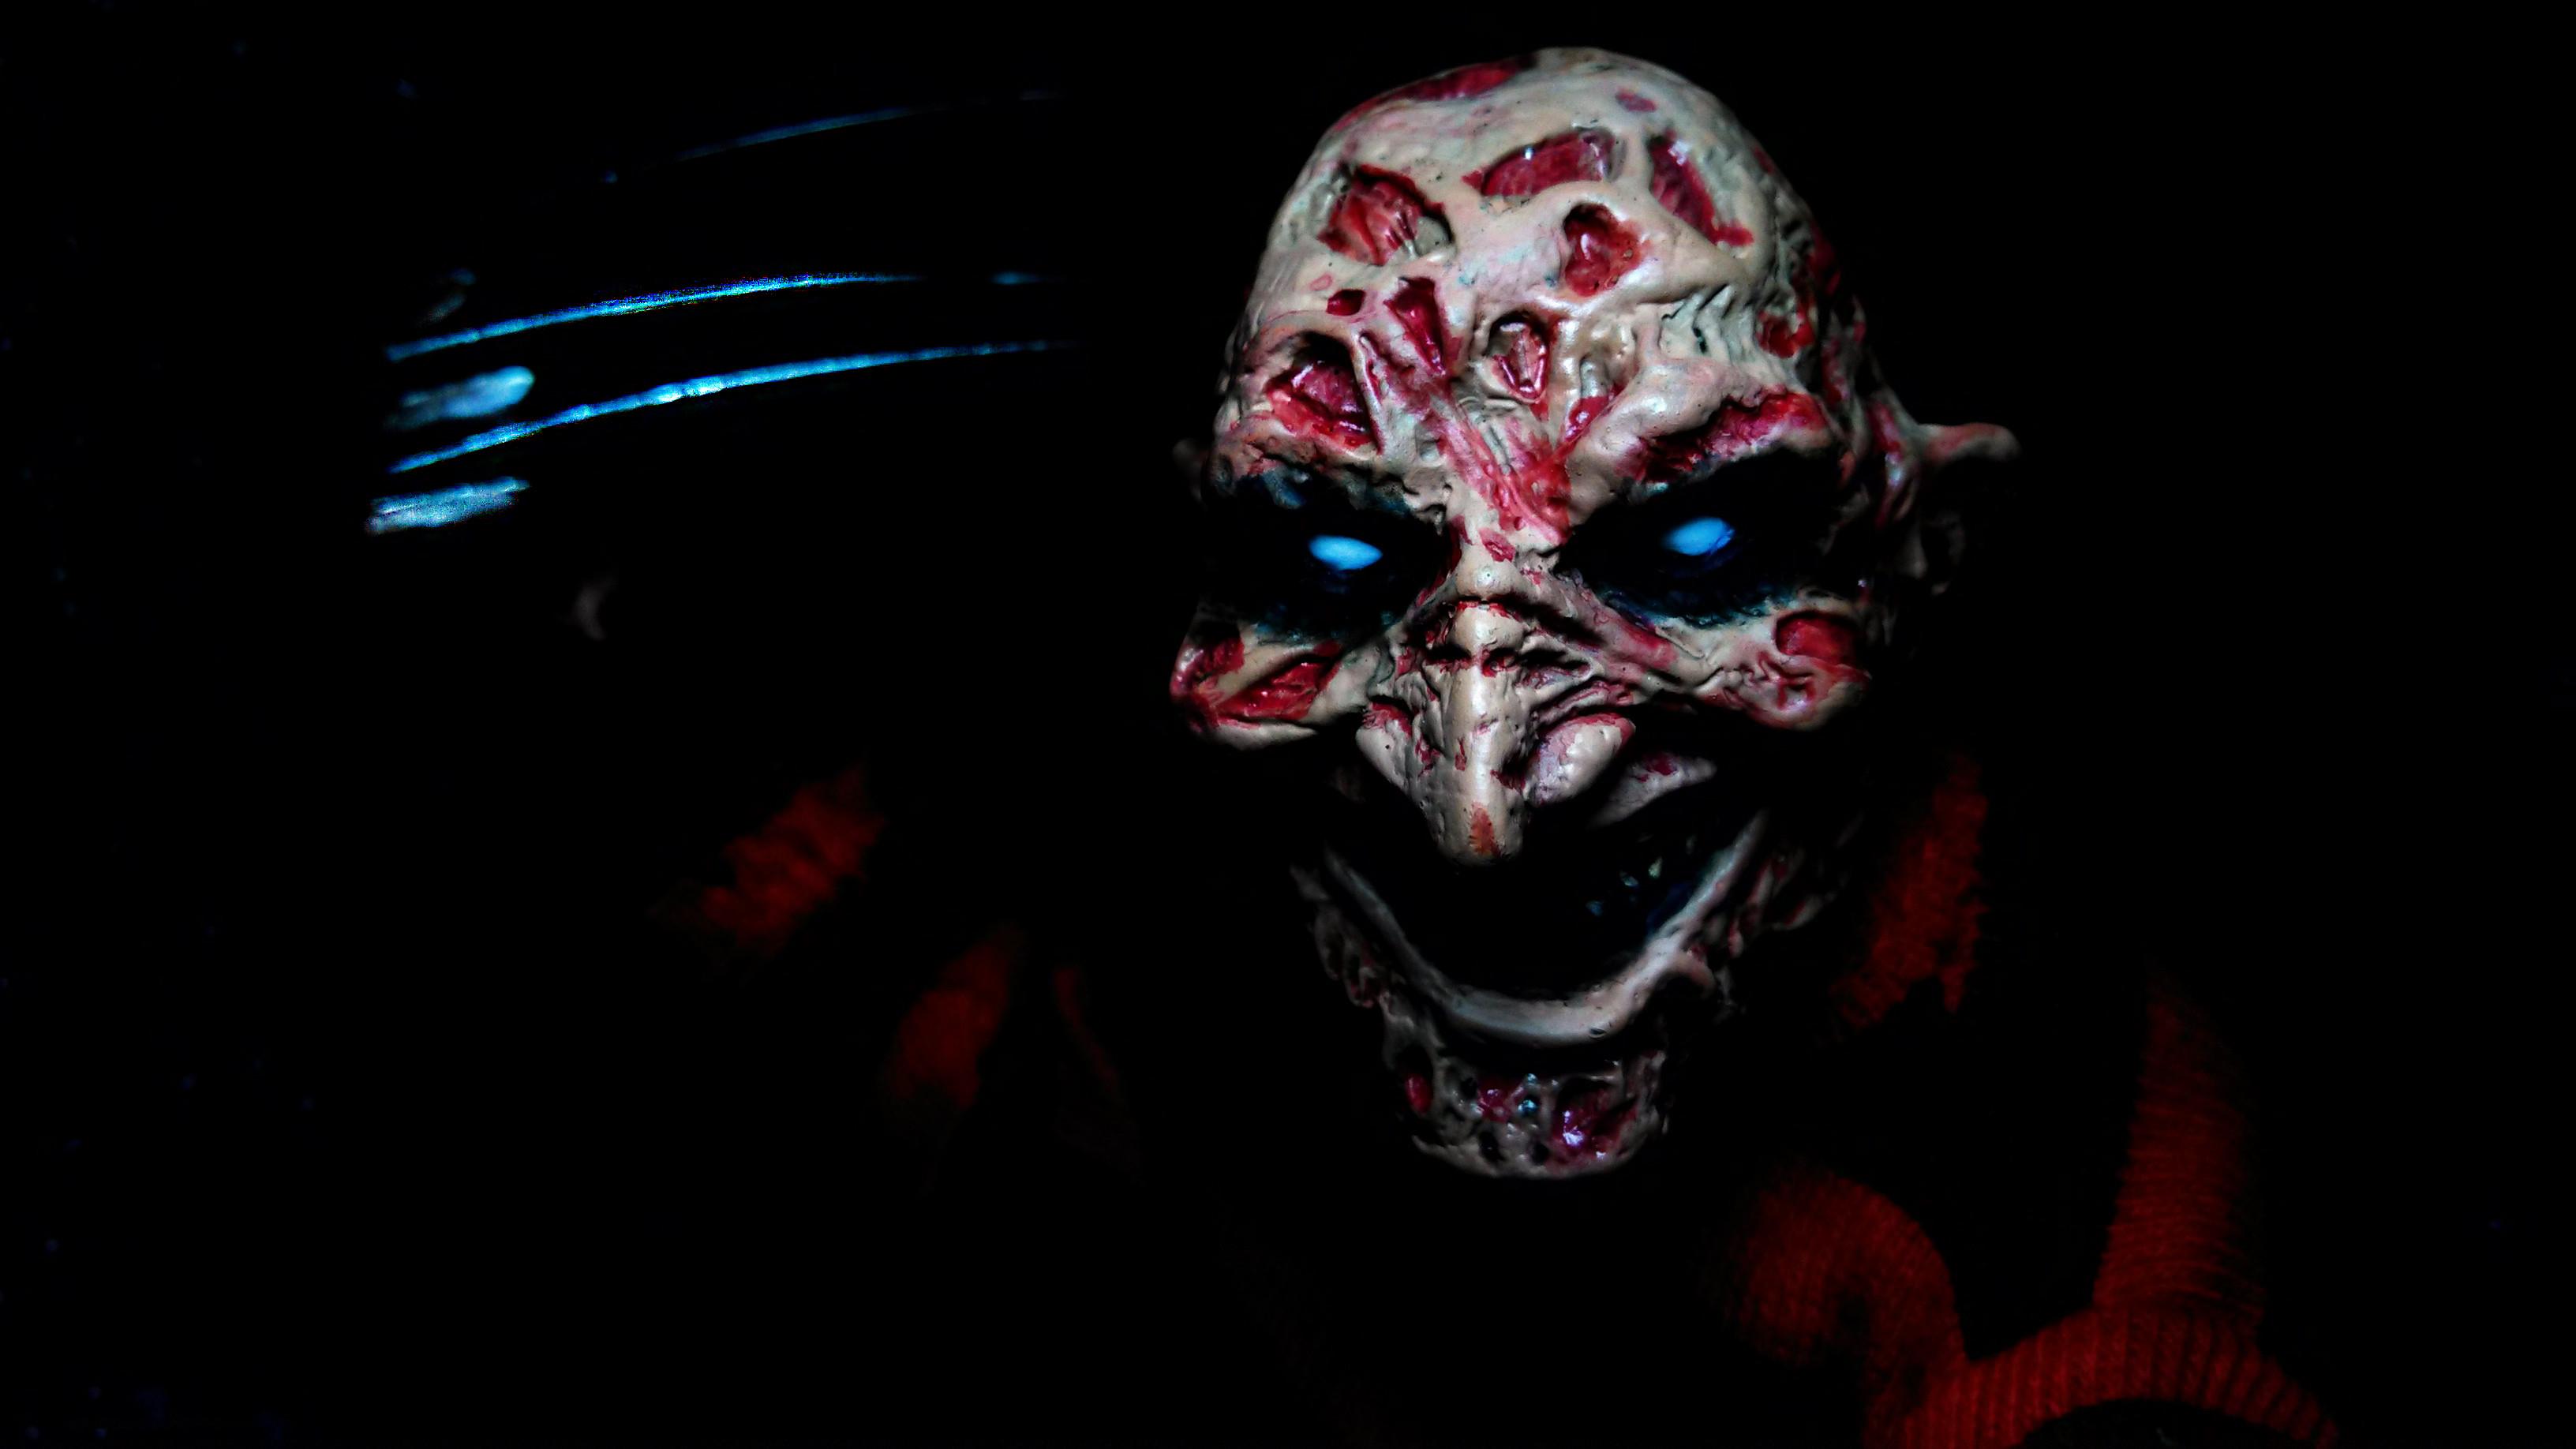 Freddy Krueger Wallpaper Funny   Doblelolcom 3264x1836